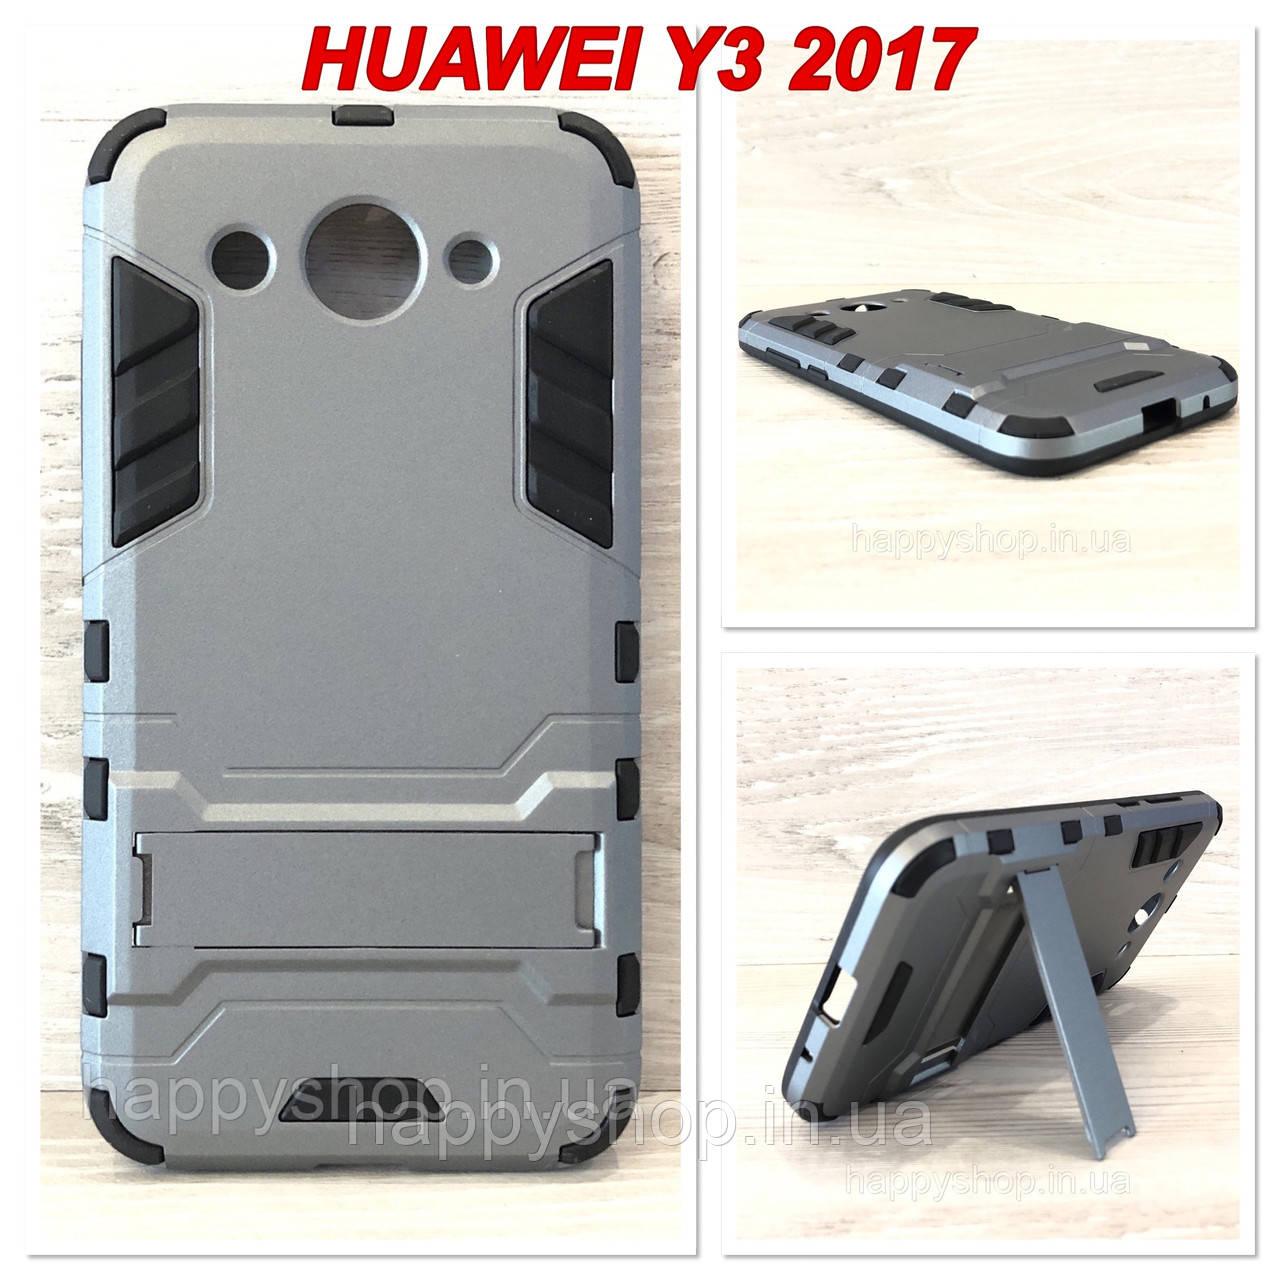 Пластиковый чехол Honor для Huawei Y3 2017